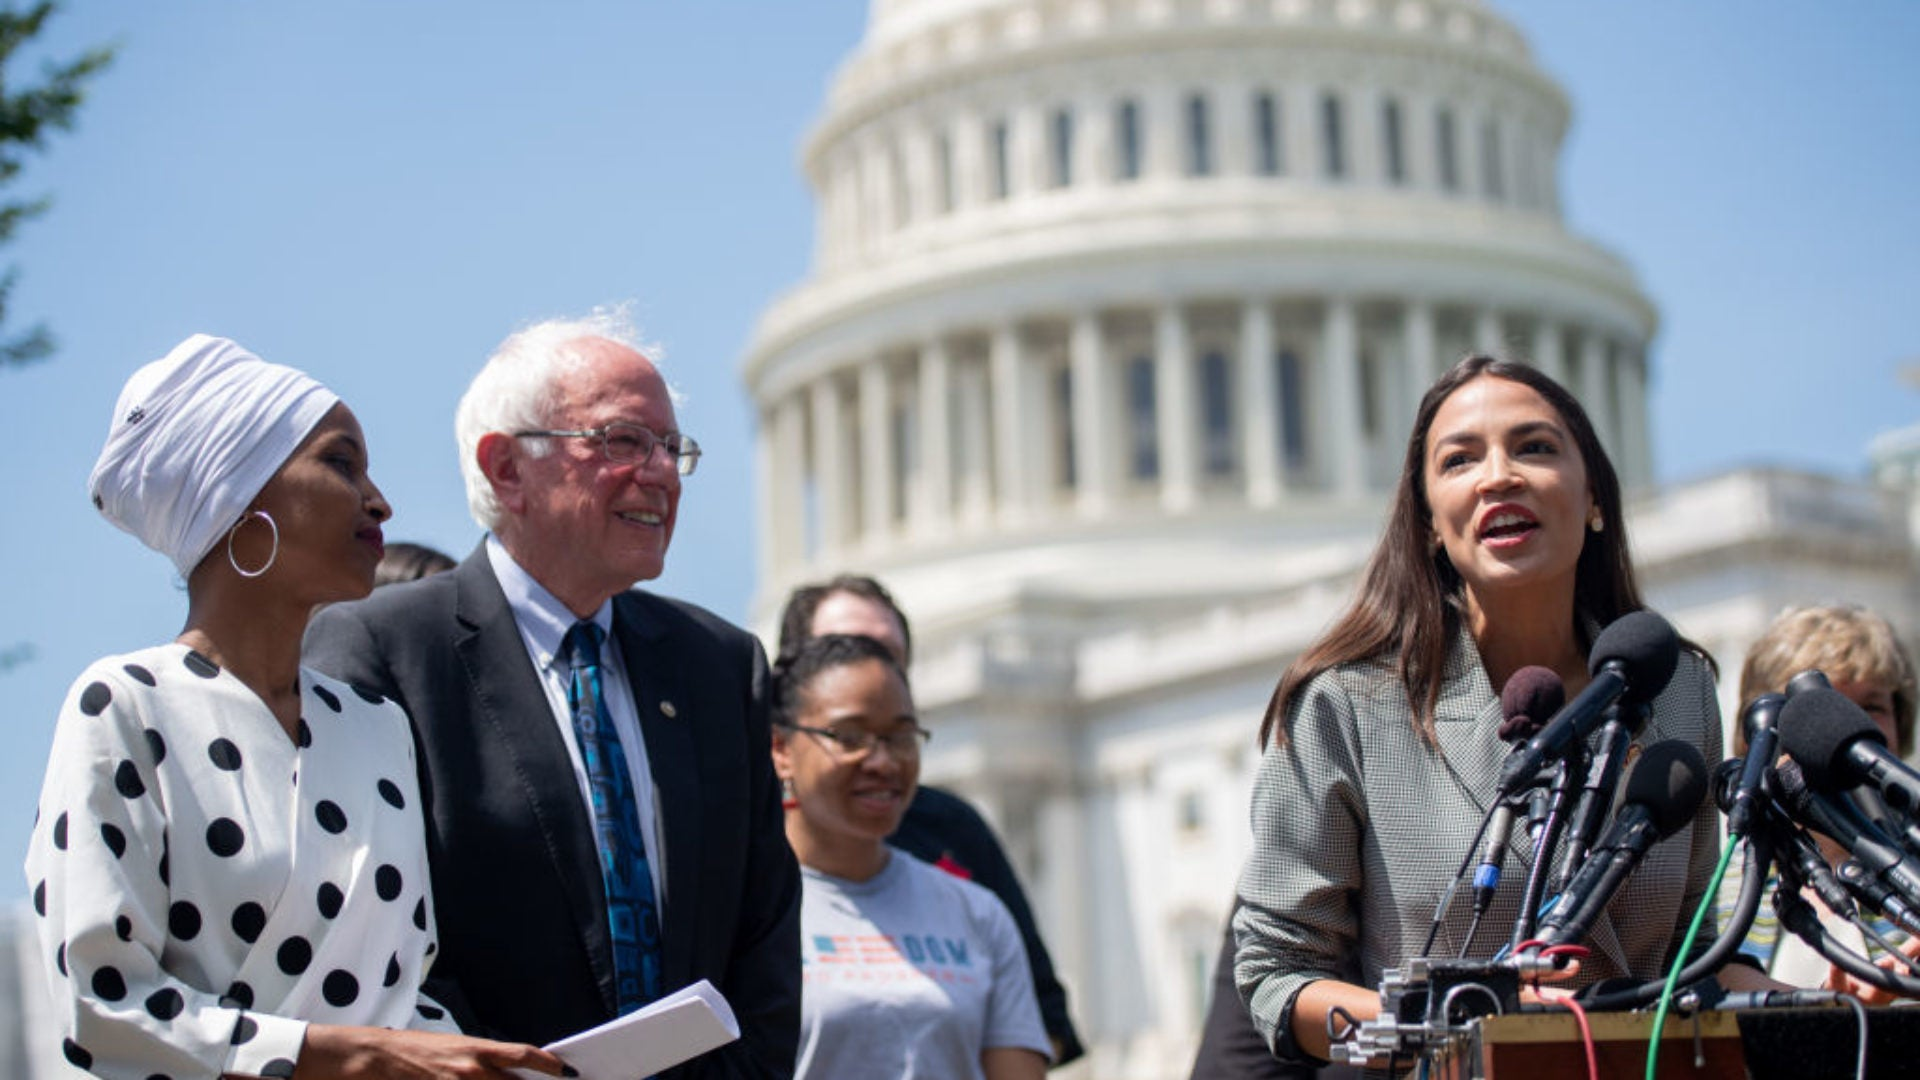 Bernie Sanders Picks Up Three Major Endorsements From 'The Squad'